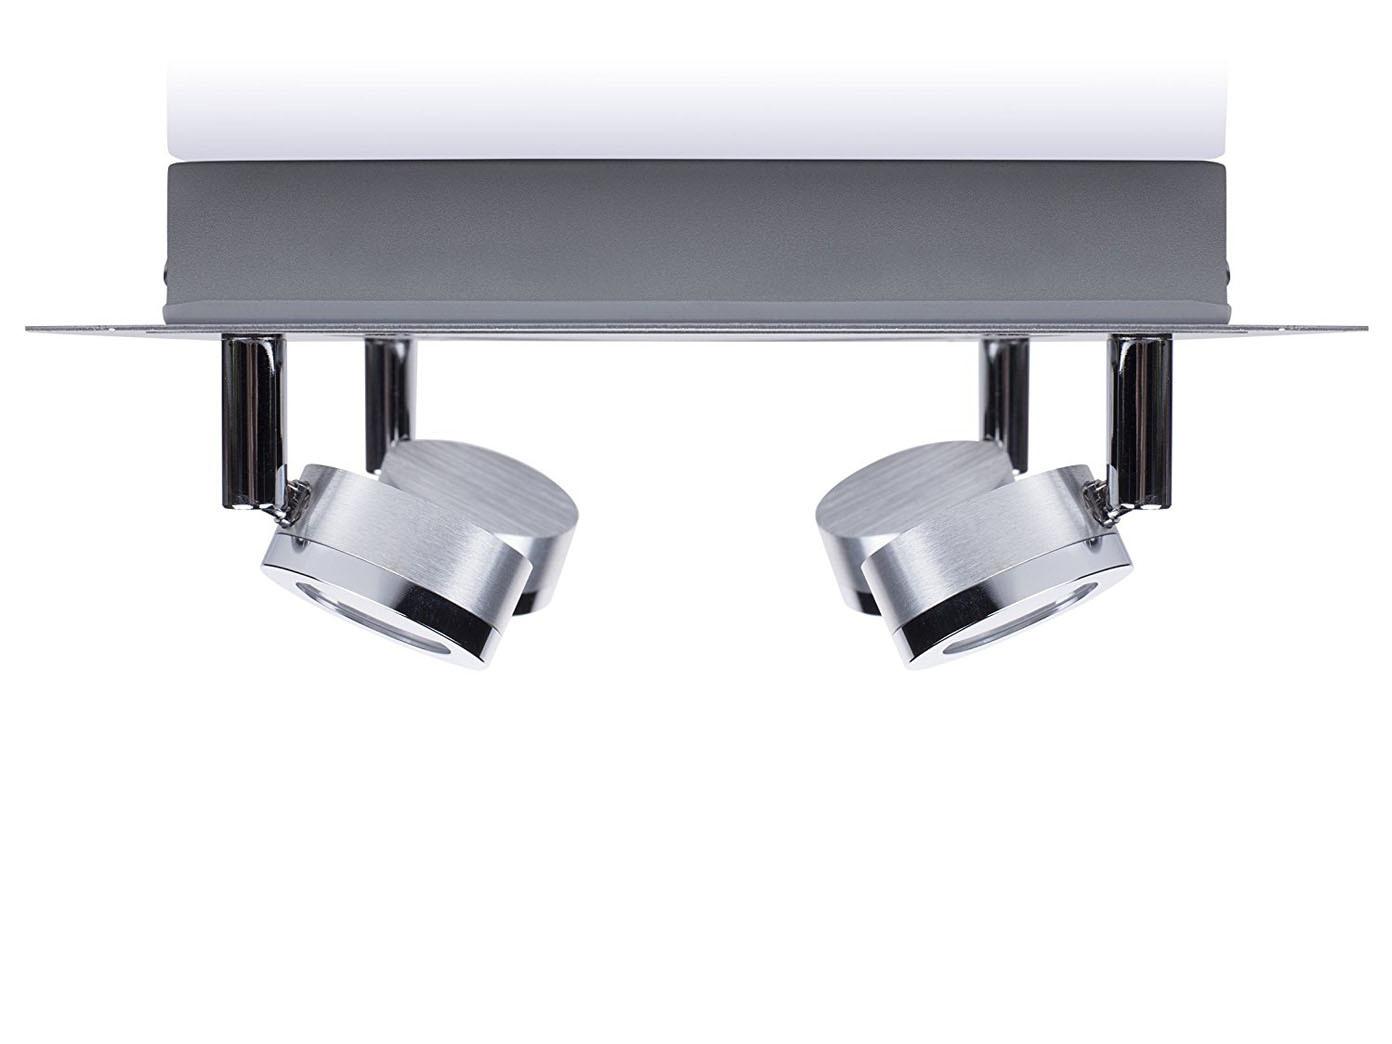 2stk led badlampen deckenleuchten schwenkbare deckspots. Black Bedroom Furniture Sets. Home Design Ideas